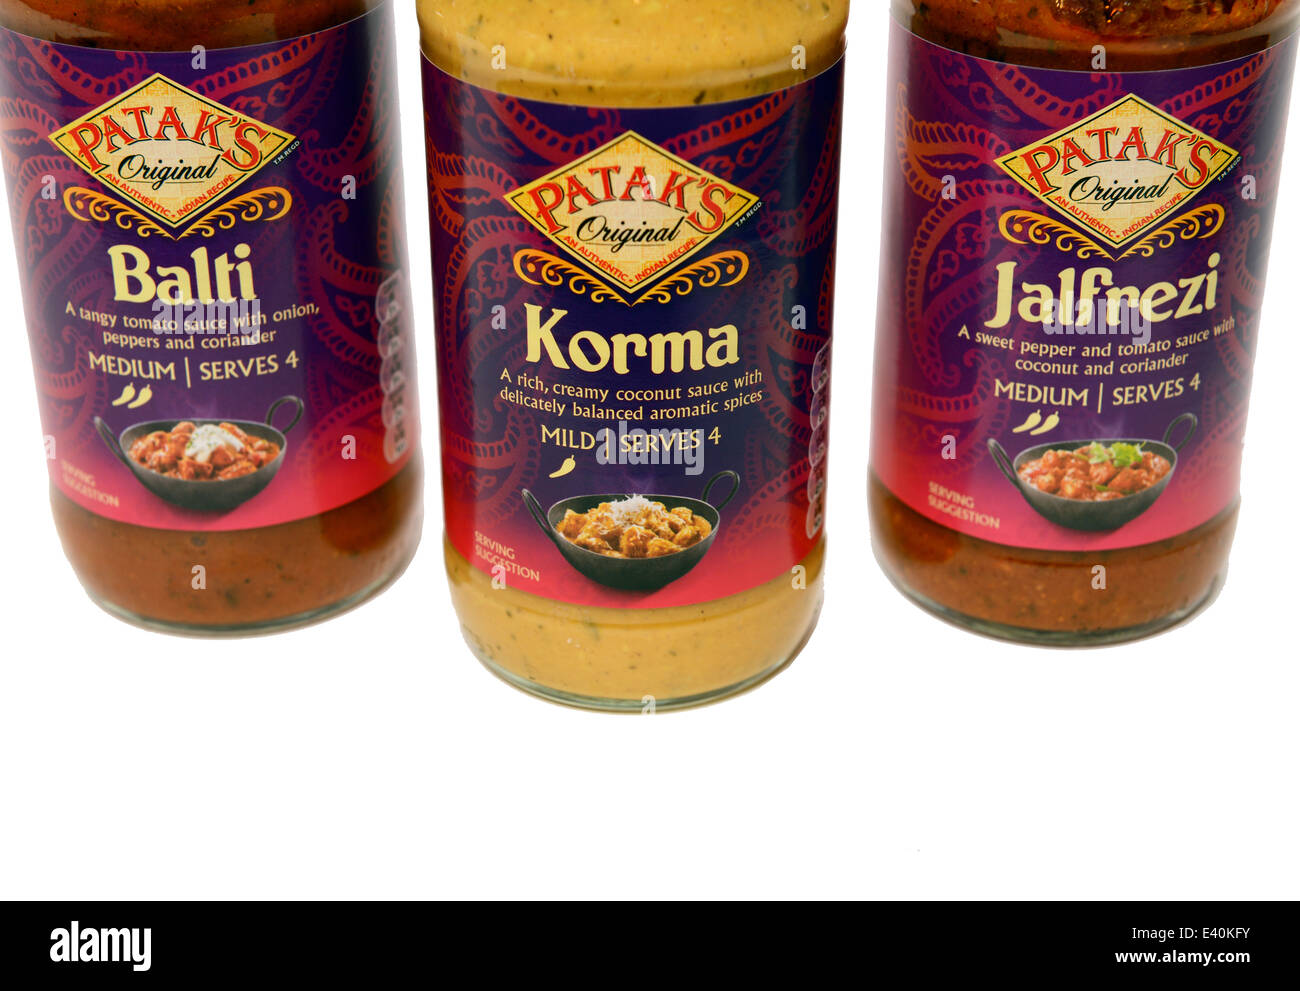 Patak's Curry Sauce - Stock Image